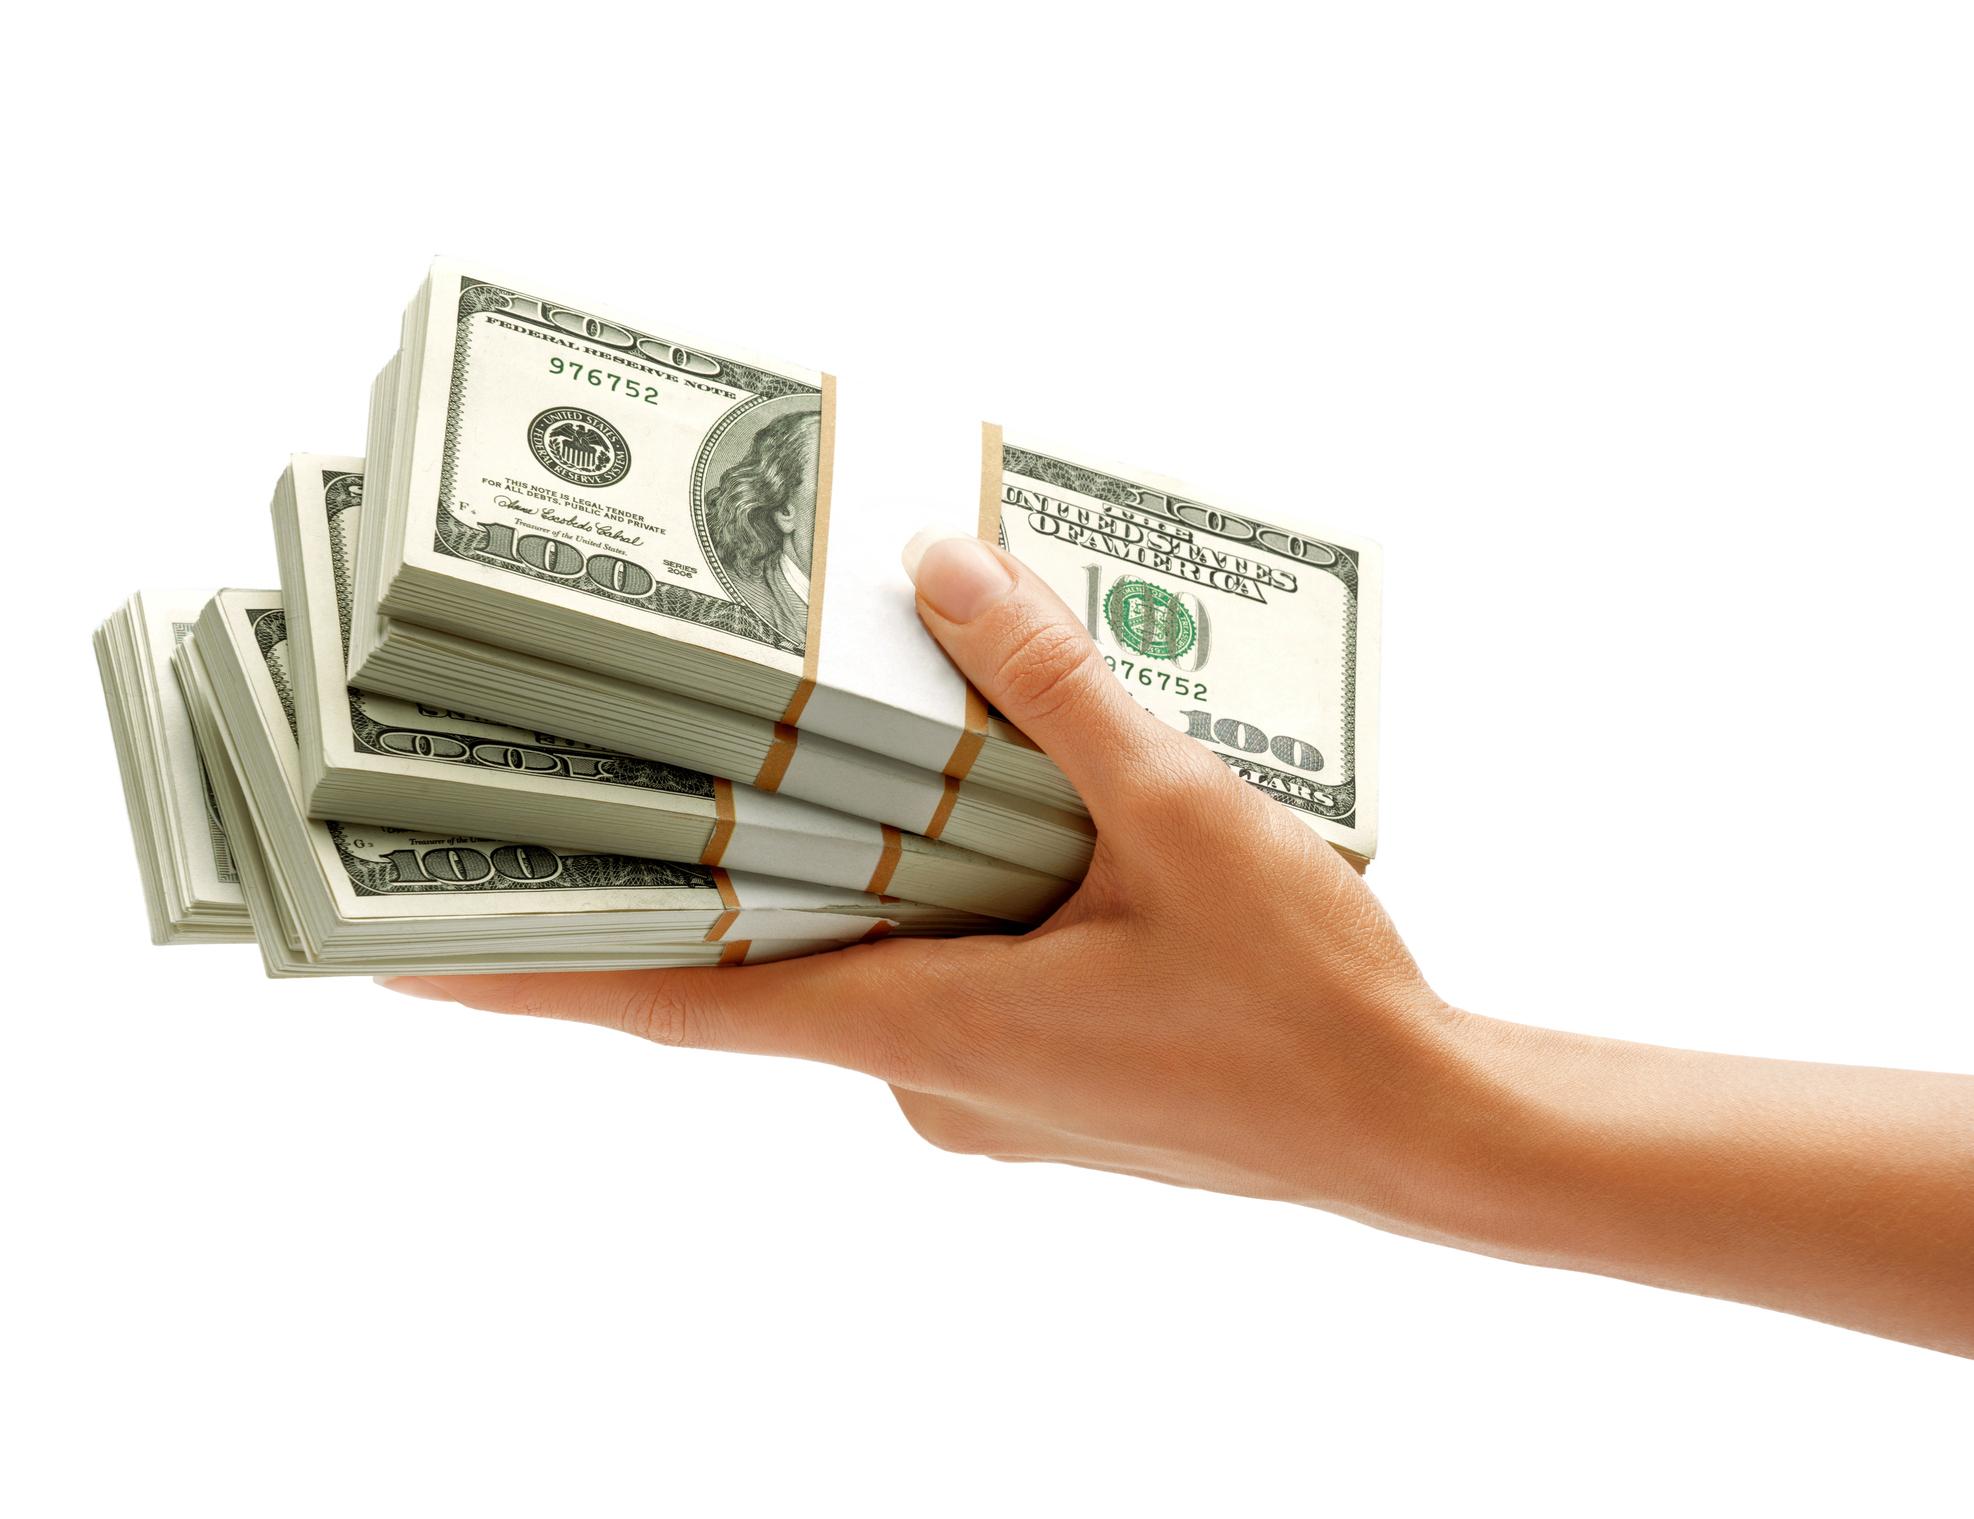 a hand holding a stack of bundles of hundred dollar bills